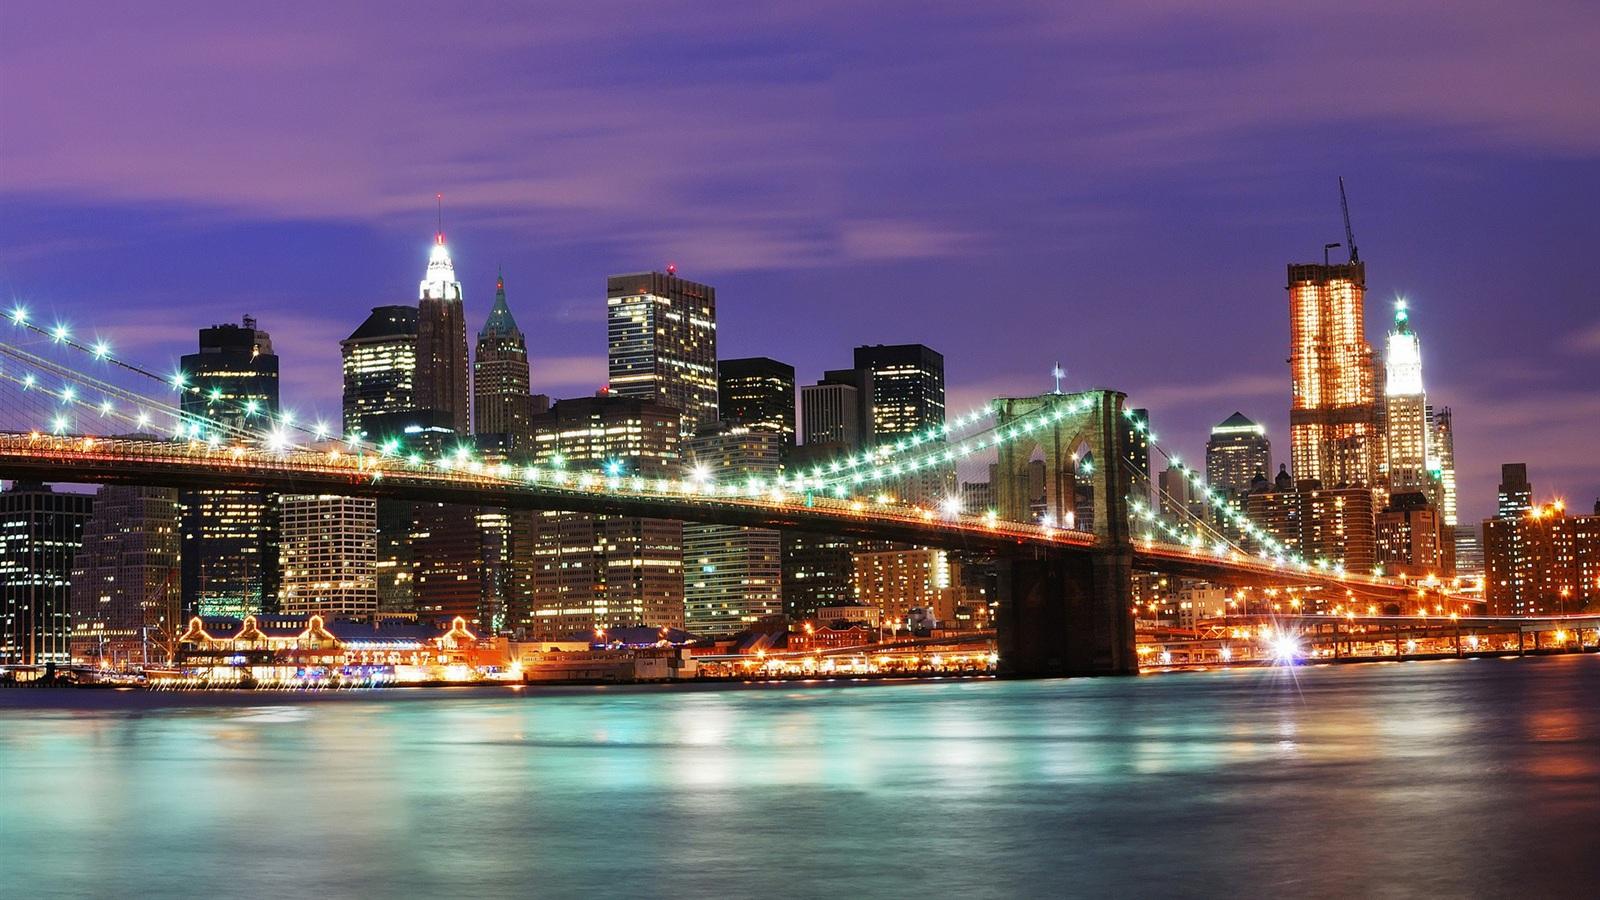 Vereinigte staaten new york city nacht 1920x1200 hd for Immagini desktop new york